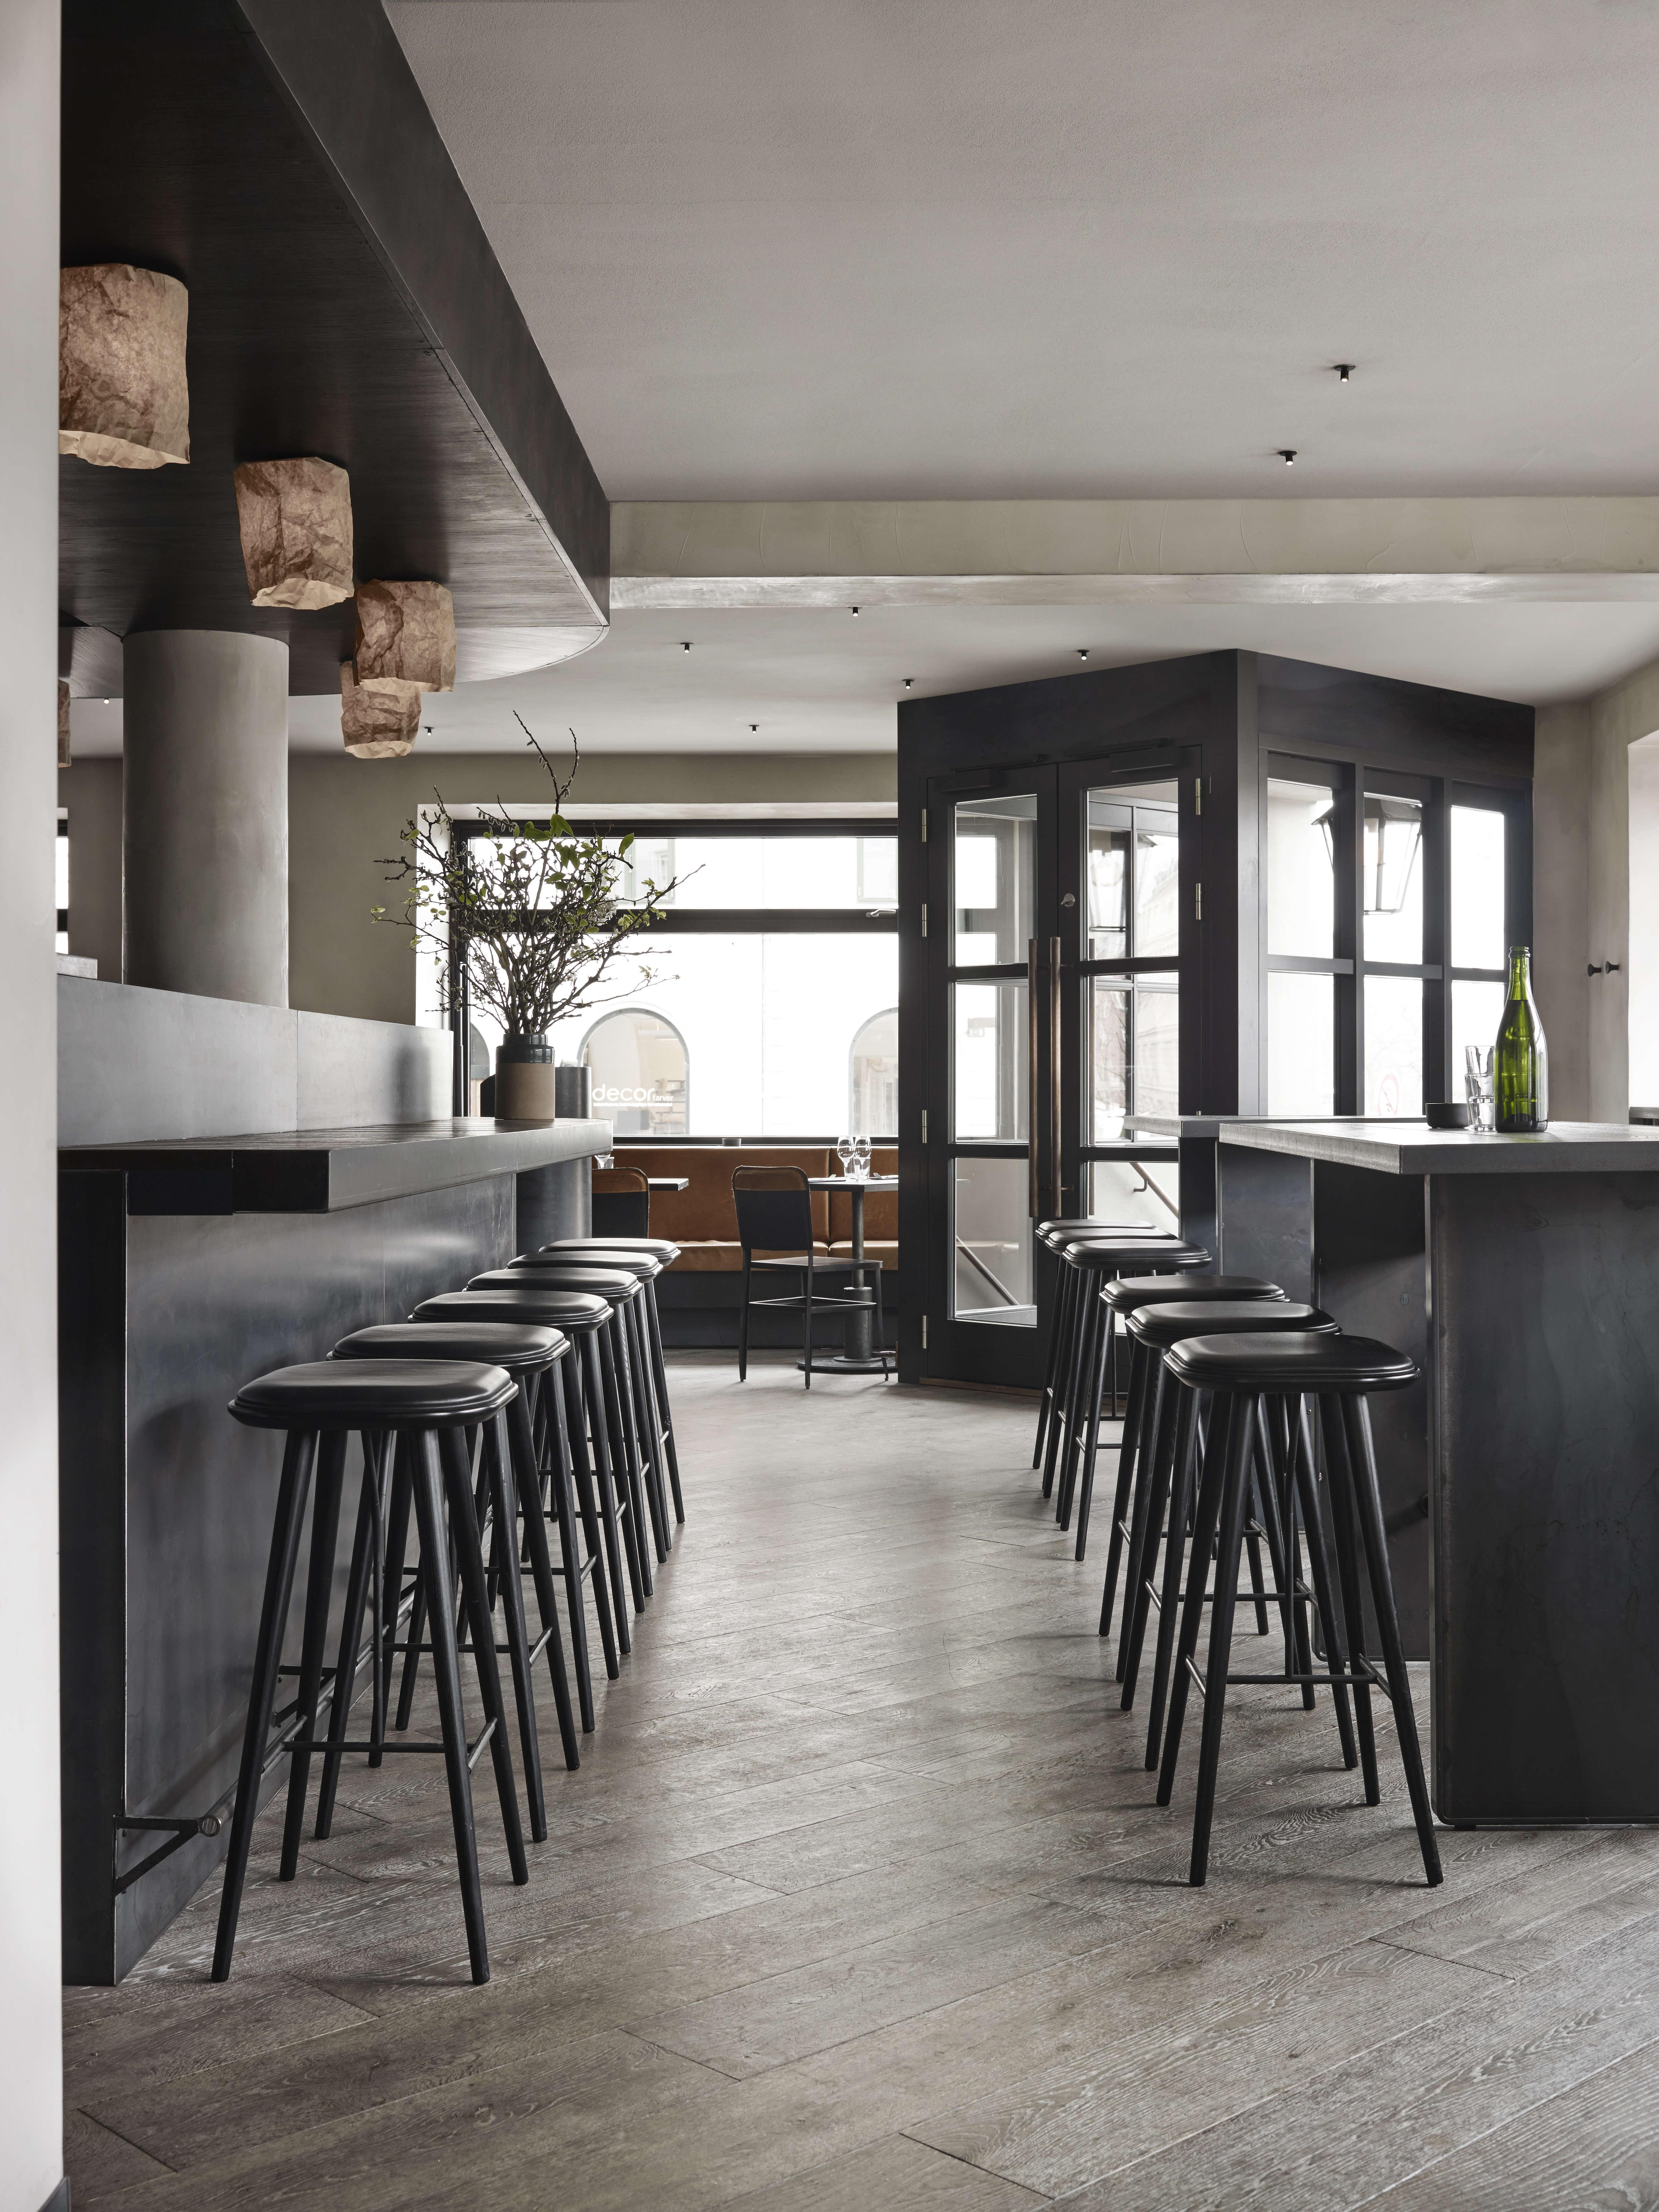 Musling Restaurant in Copenhagen Designed by SPACE Copenhagen